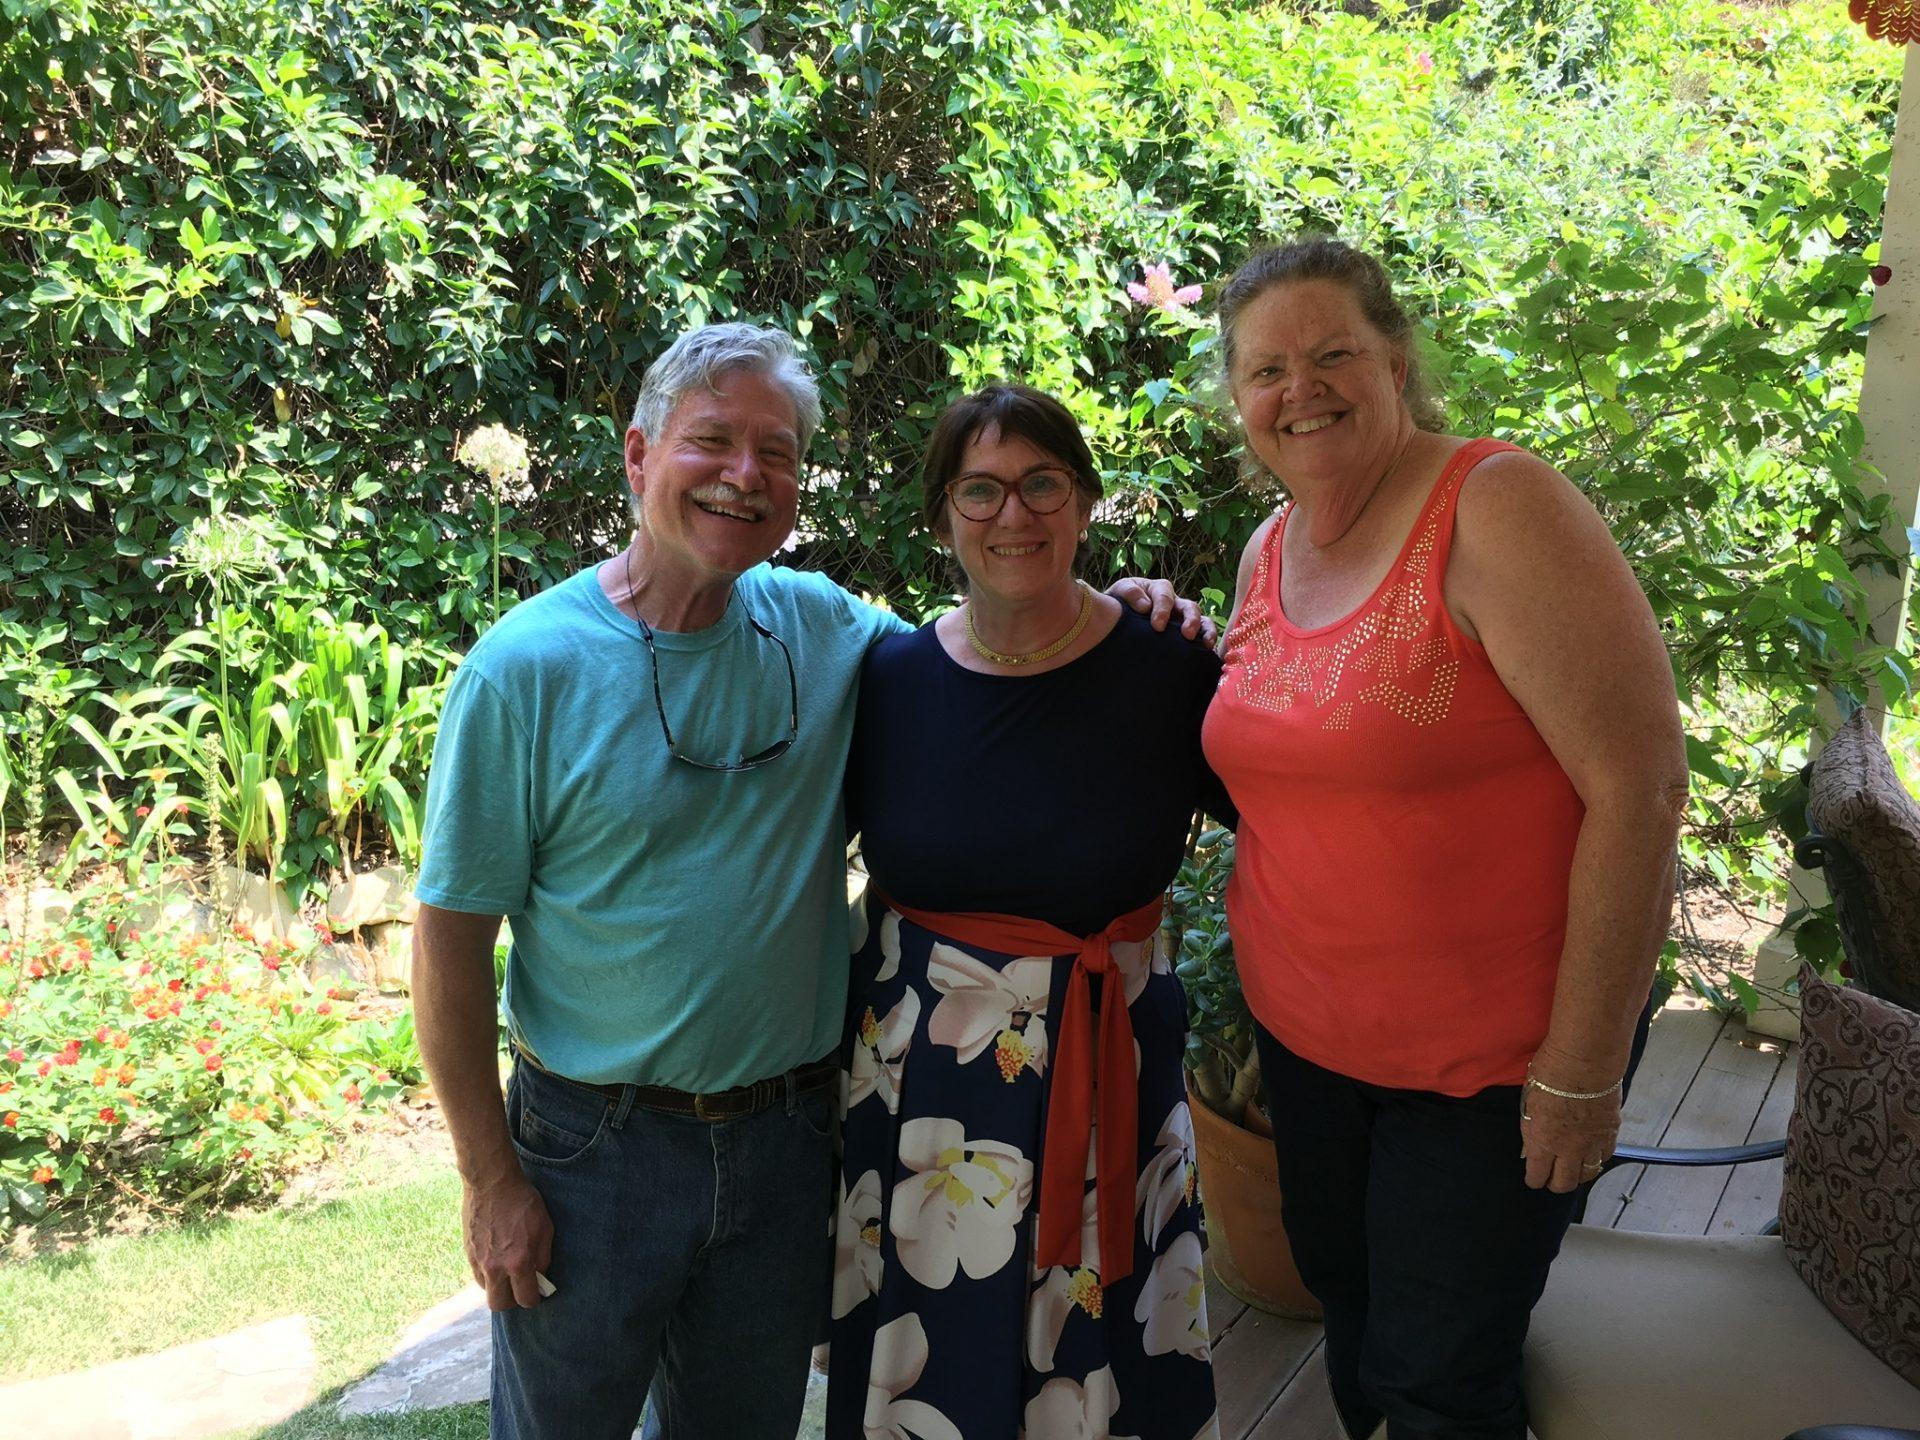 Lane, Peter and Carolyn at Alice Wedding 8/12/18